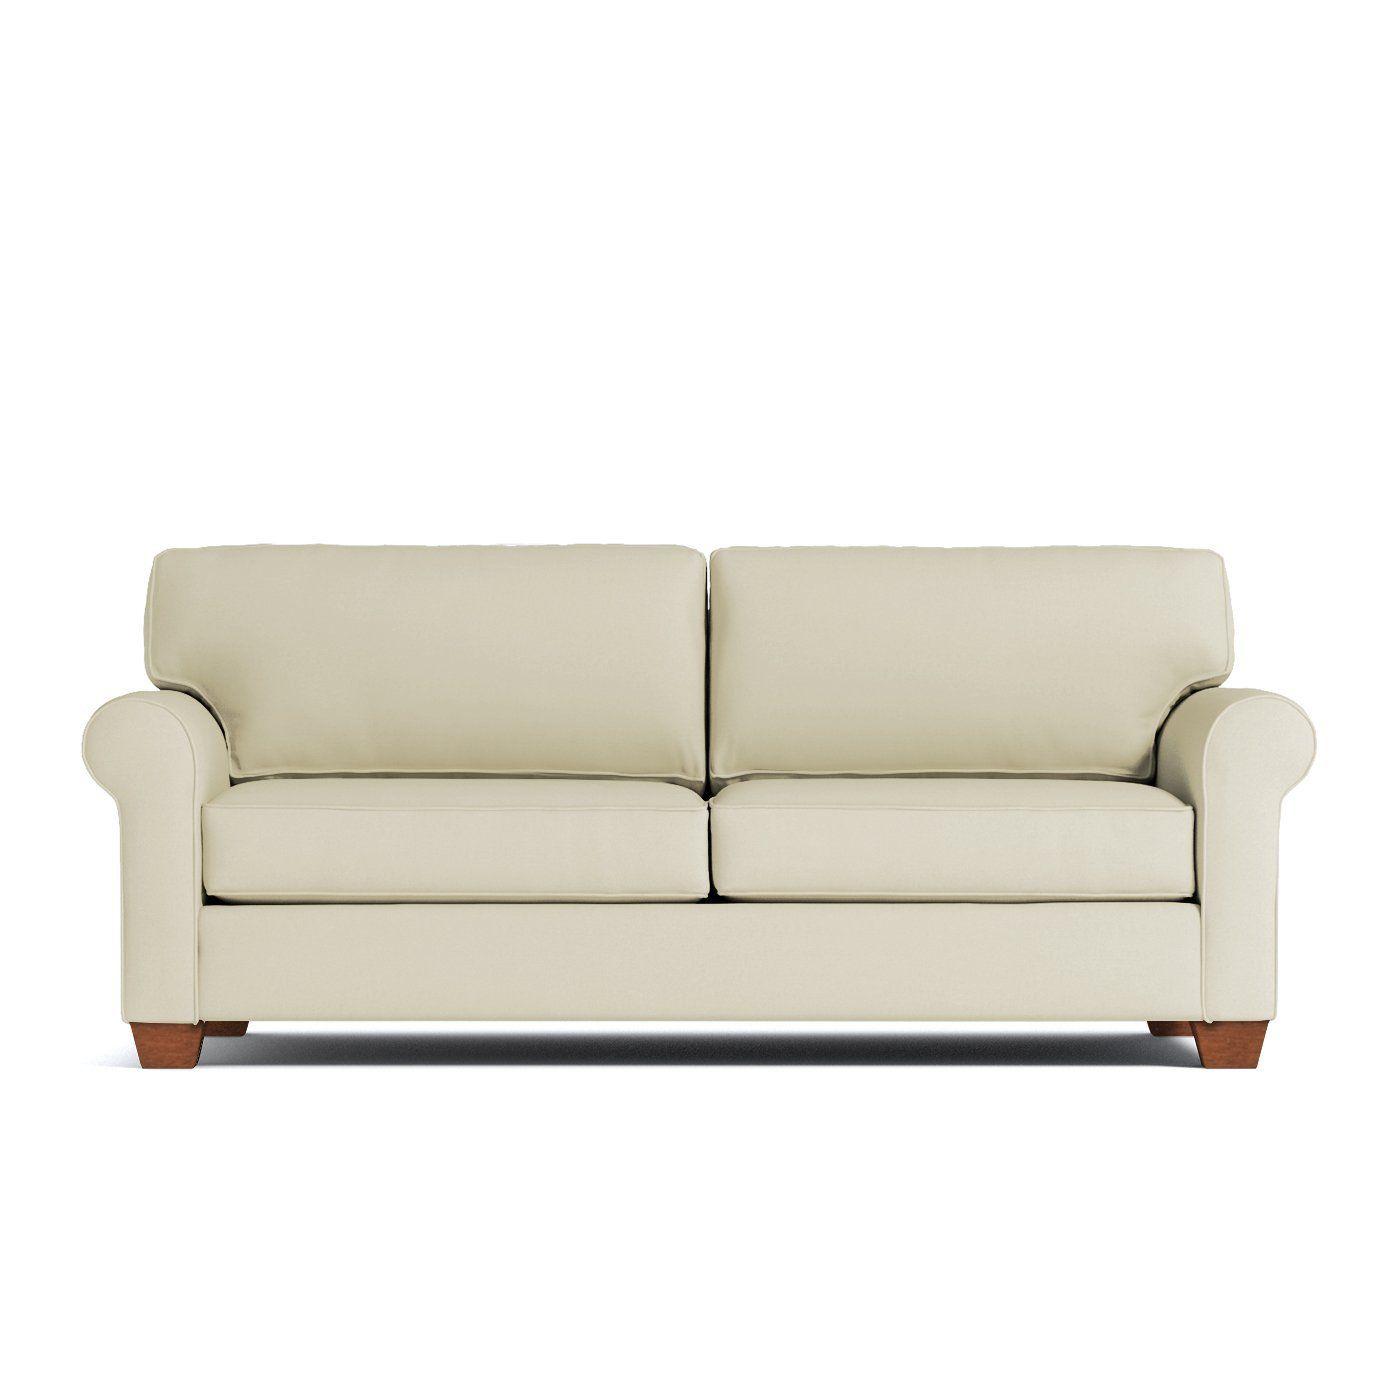 Lafayette Queen Size Sleeper Sofa Leg Finish Pecan Sleeper